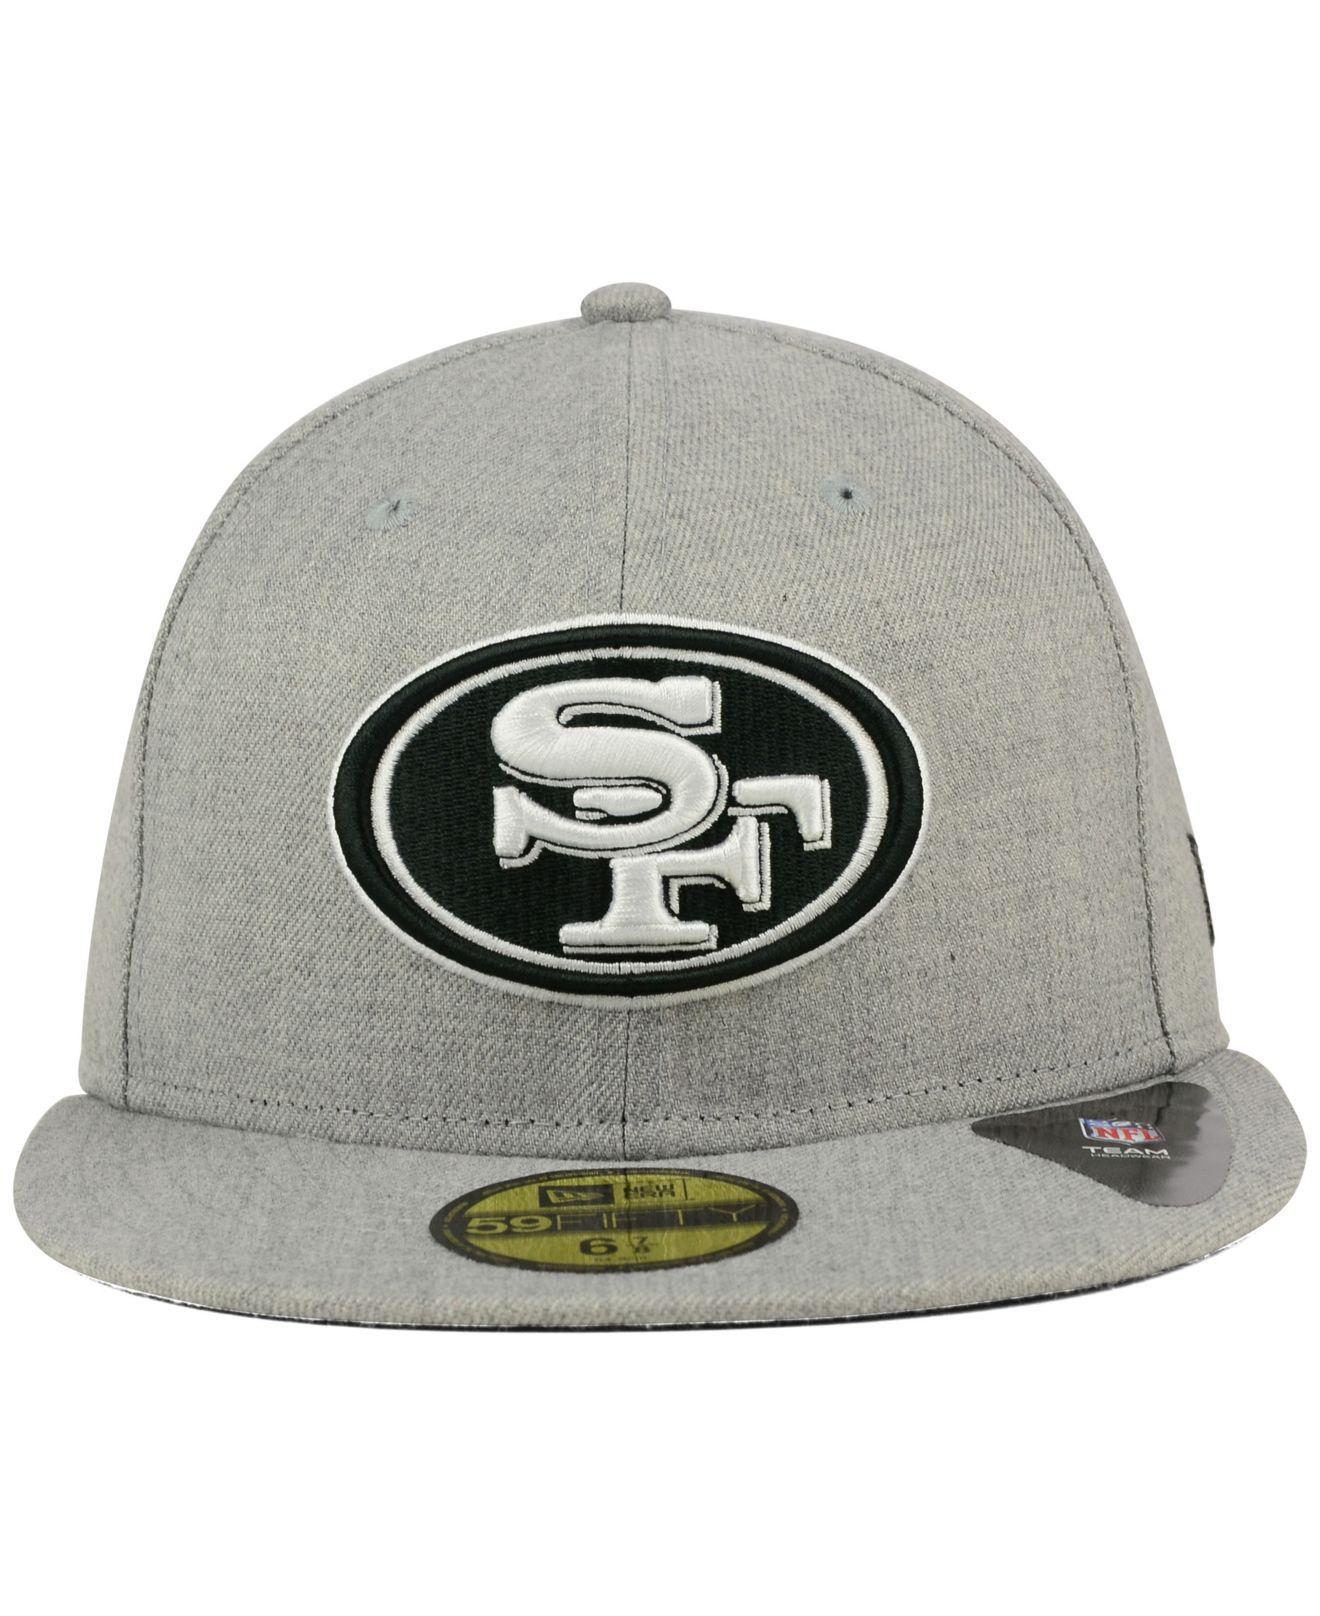 Lyst - KTZ San Francisco 49ers Heather Black White 59fifty Cap in Gray for  Men 7e680c70d